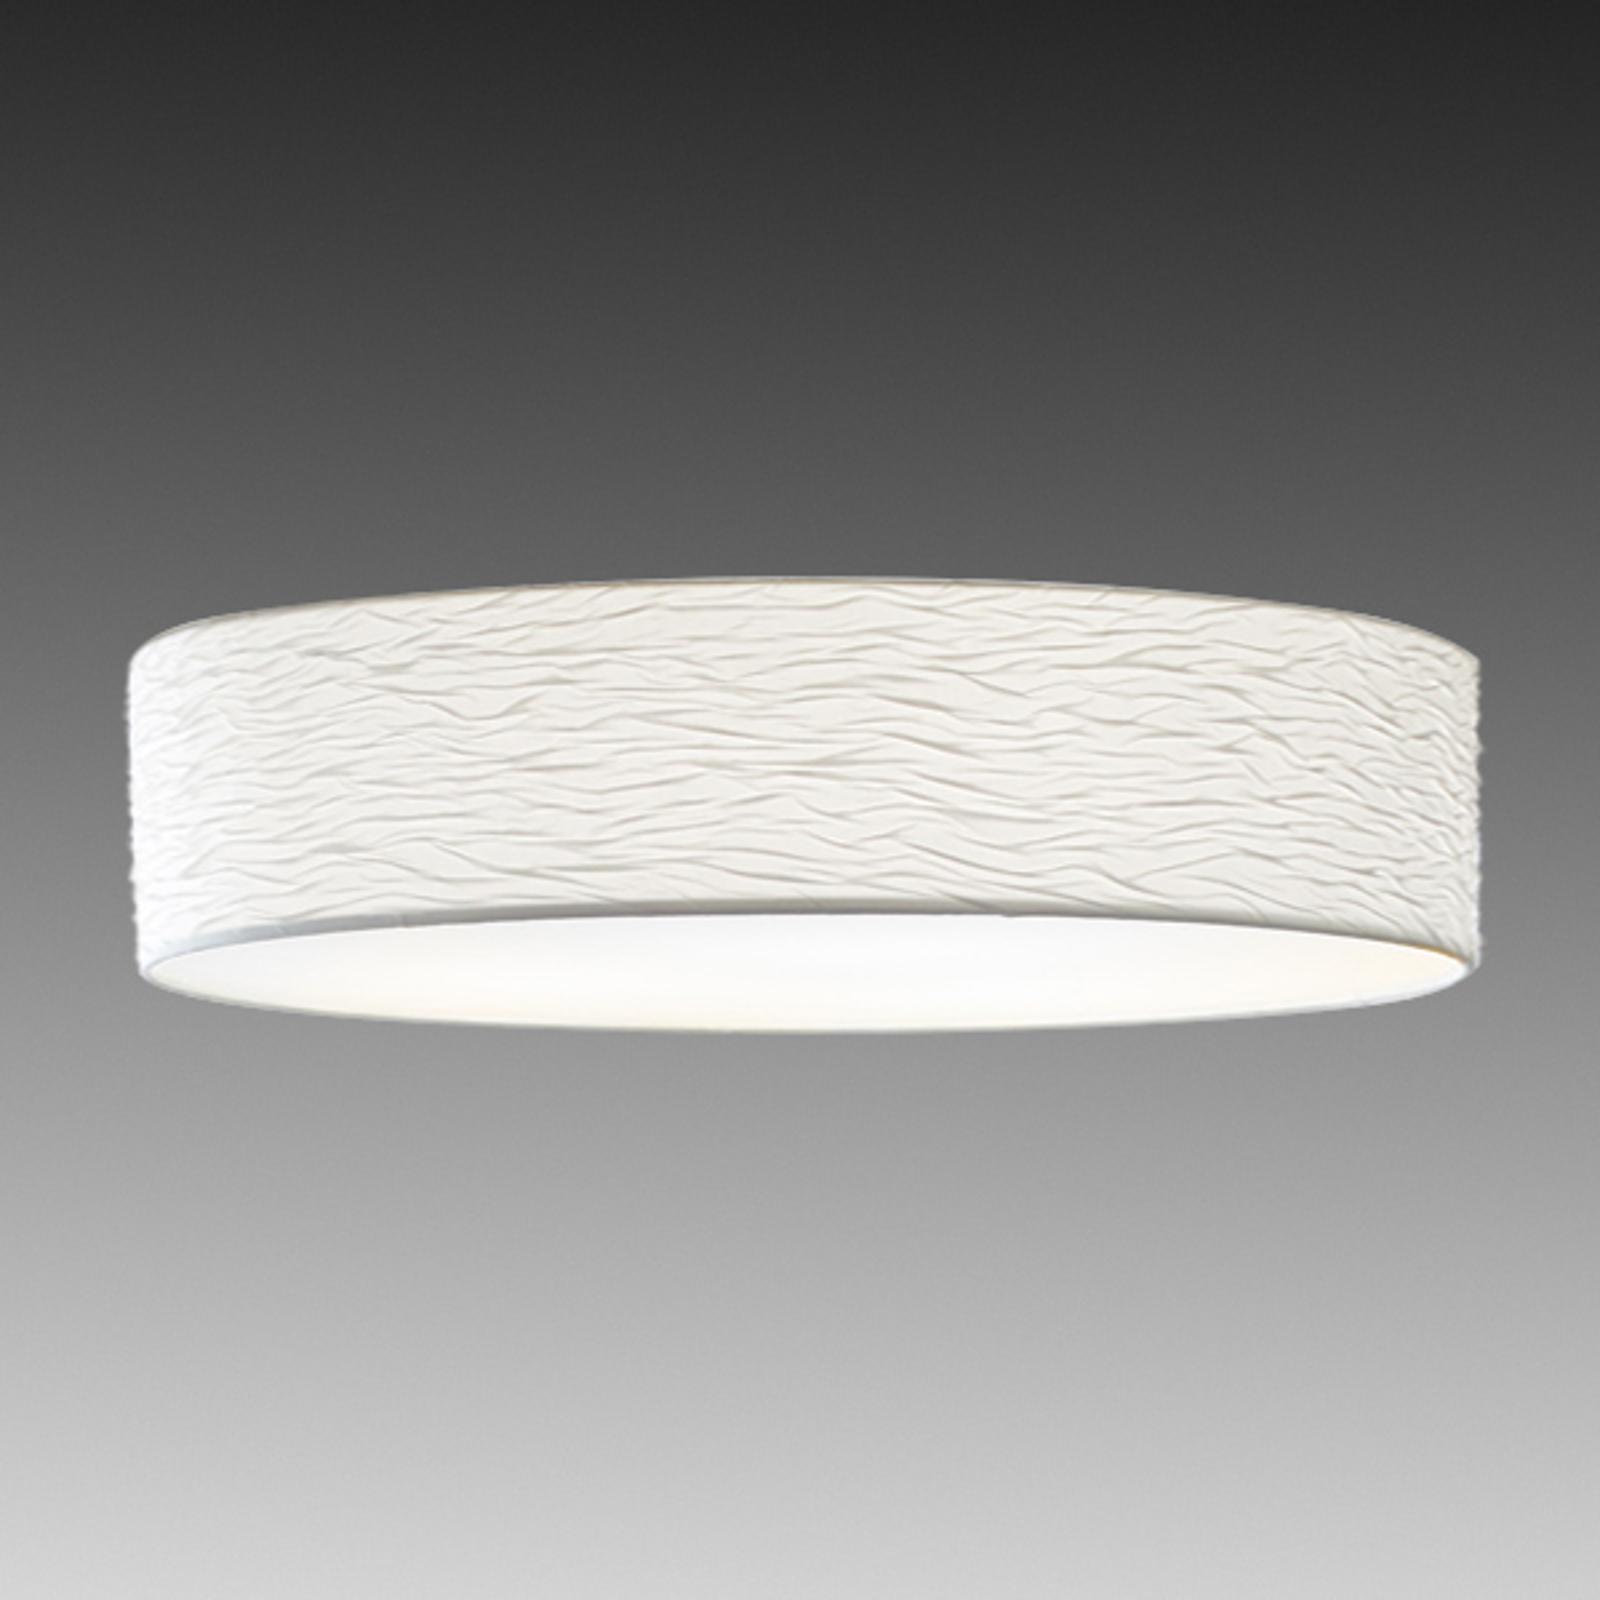 Lampa sufitowa Vita 6, z zabawnymi falami